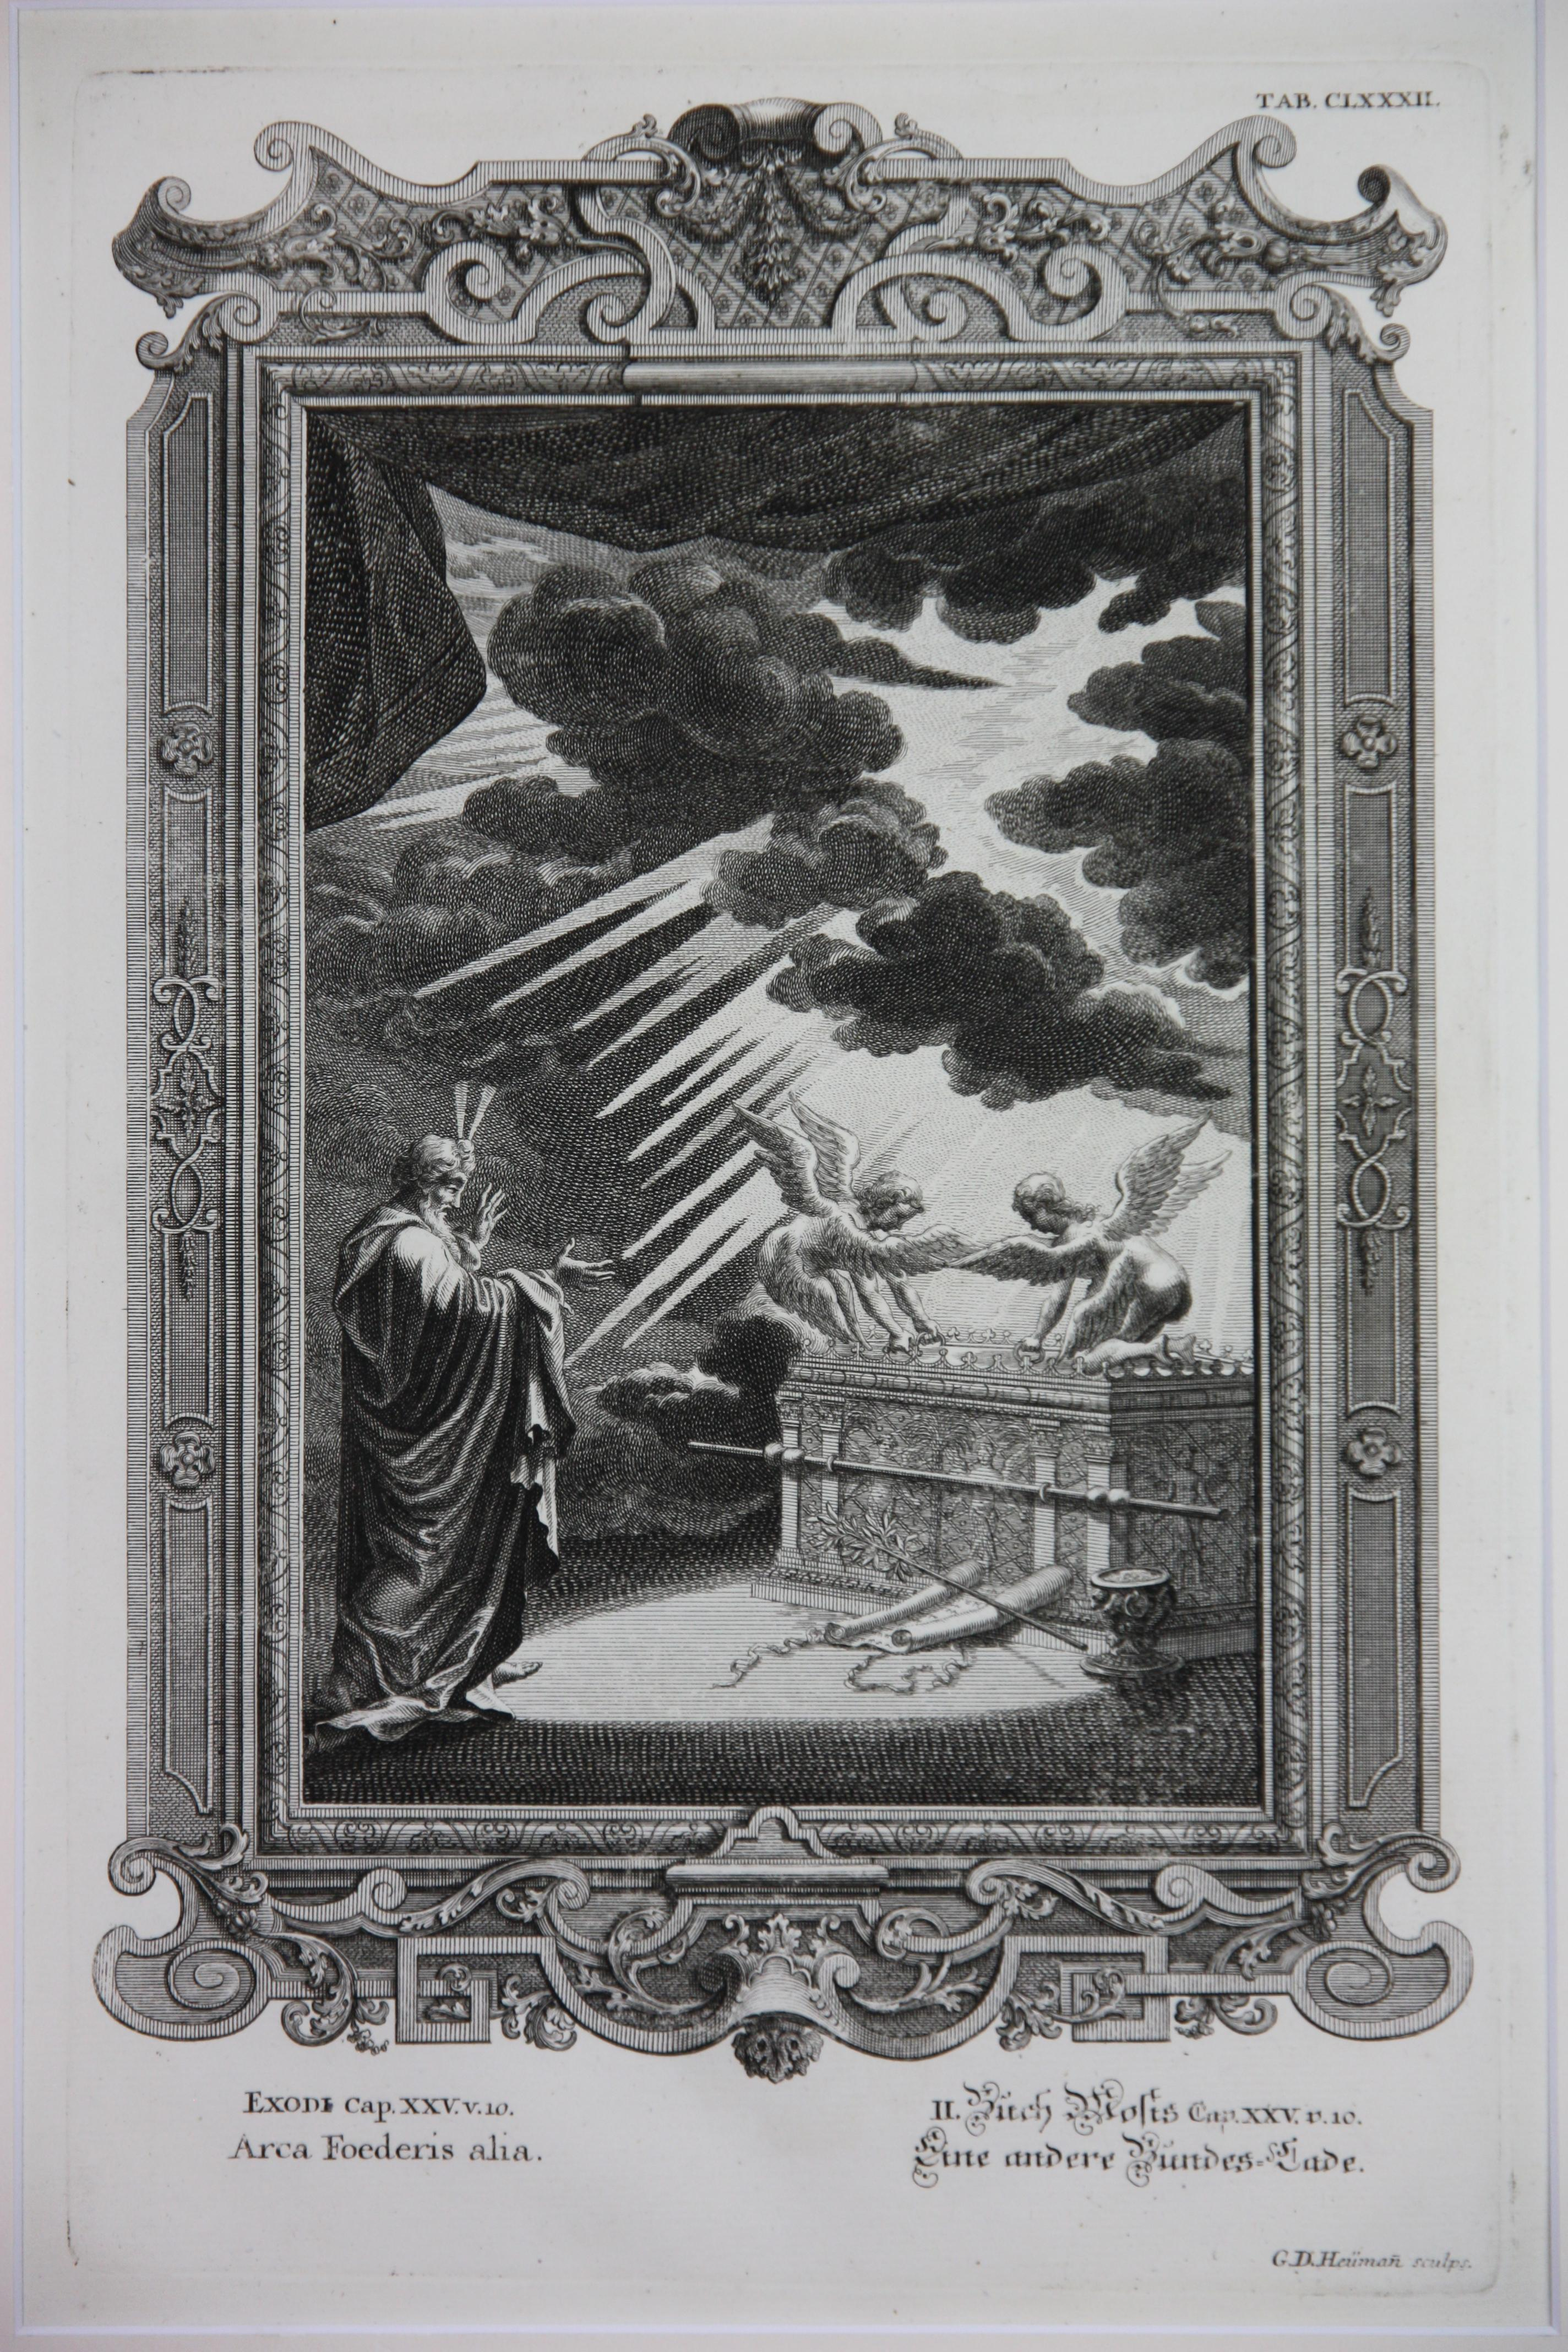 Copperplate Engraving of Biblical Scene in Exodus by: Georg Daniel Heumann